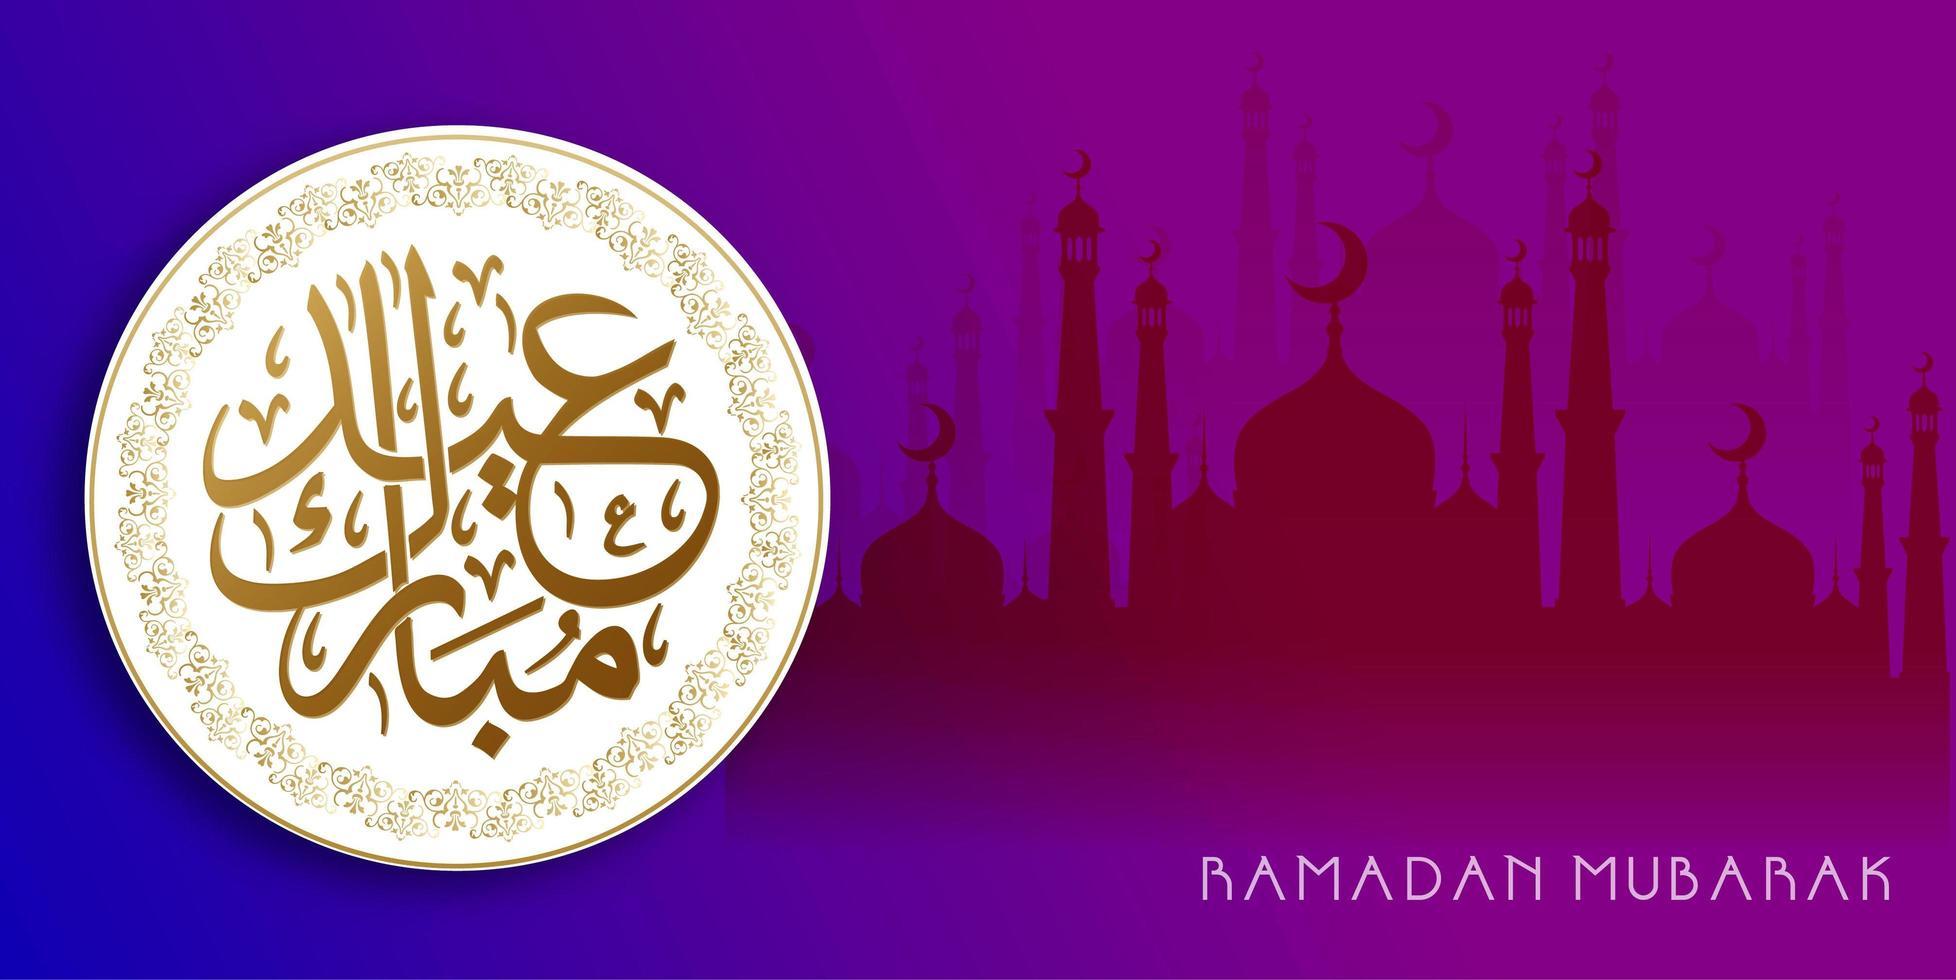 ramadan kareem blauw roze achtergrond met kleurovergang vector